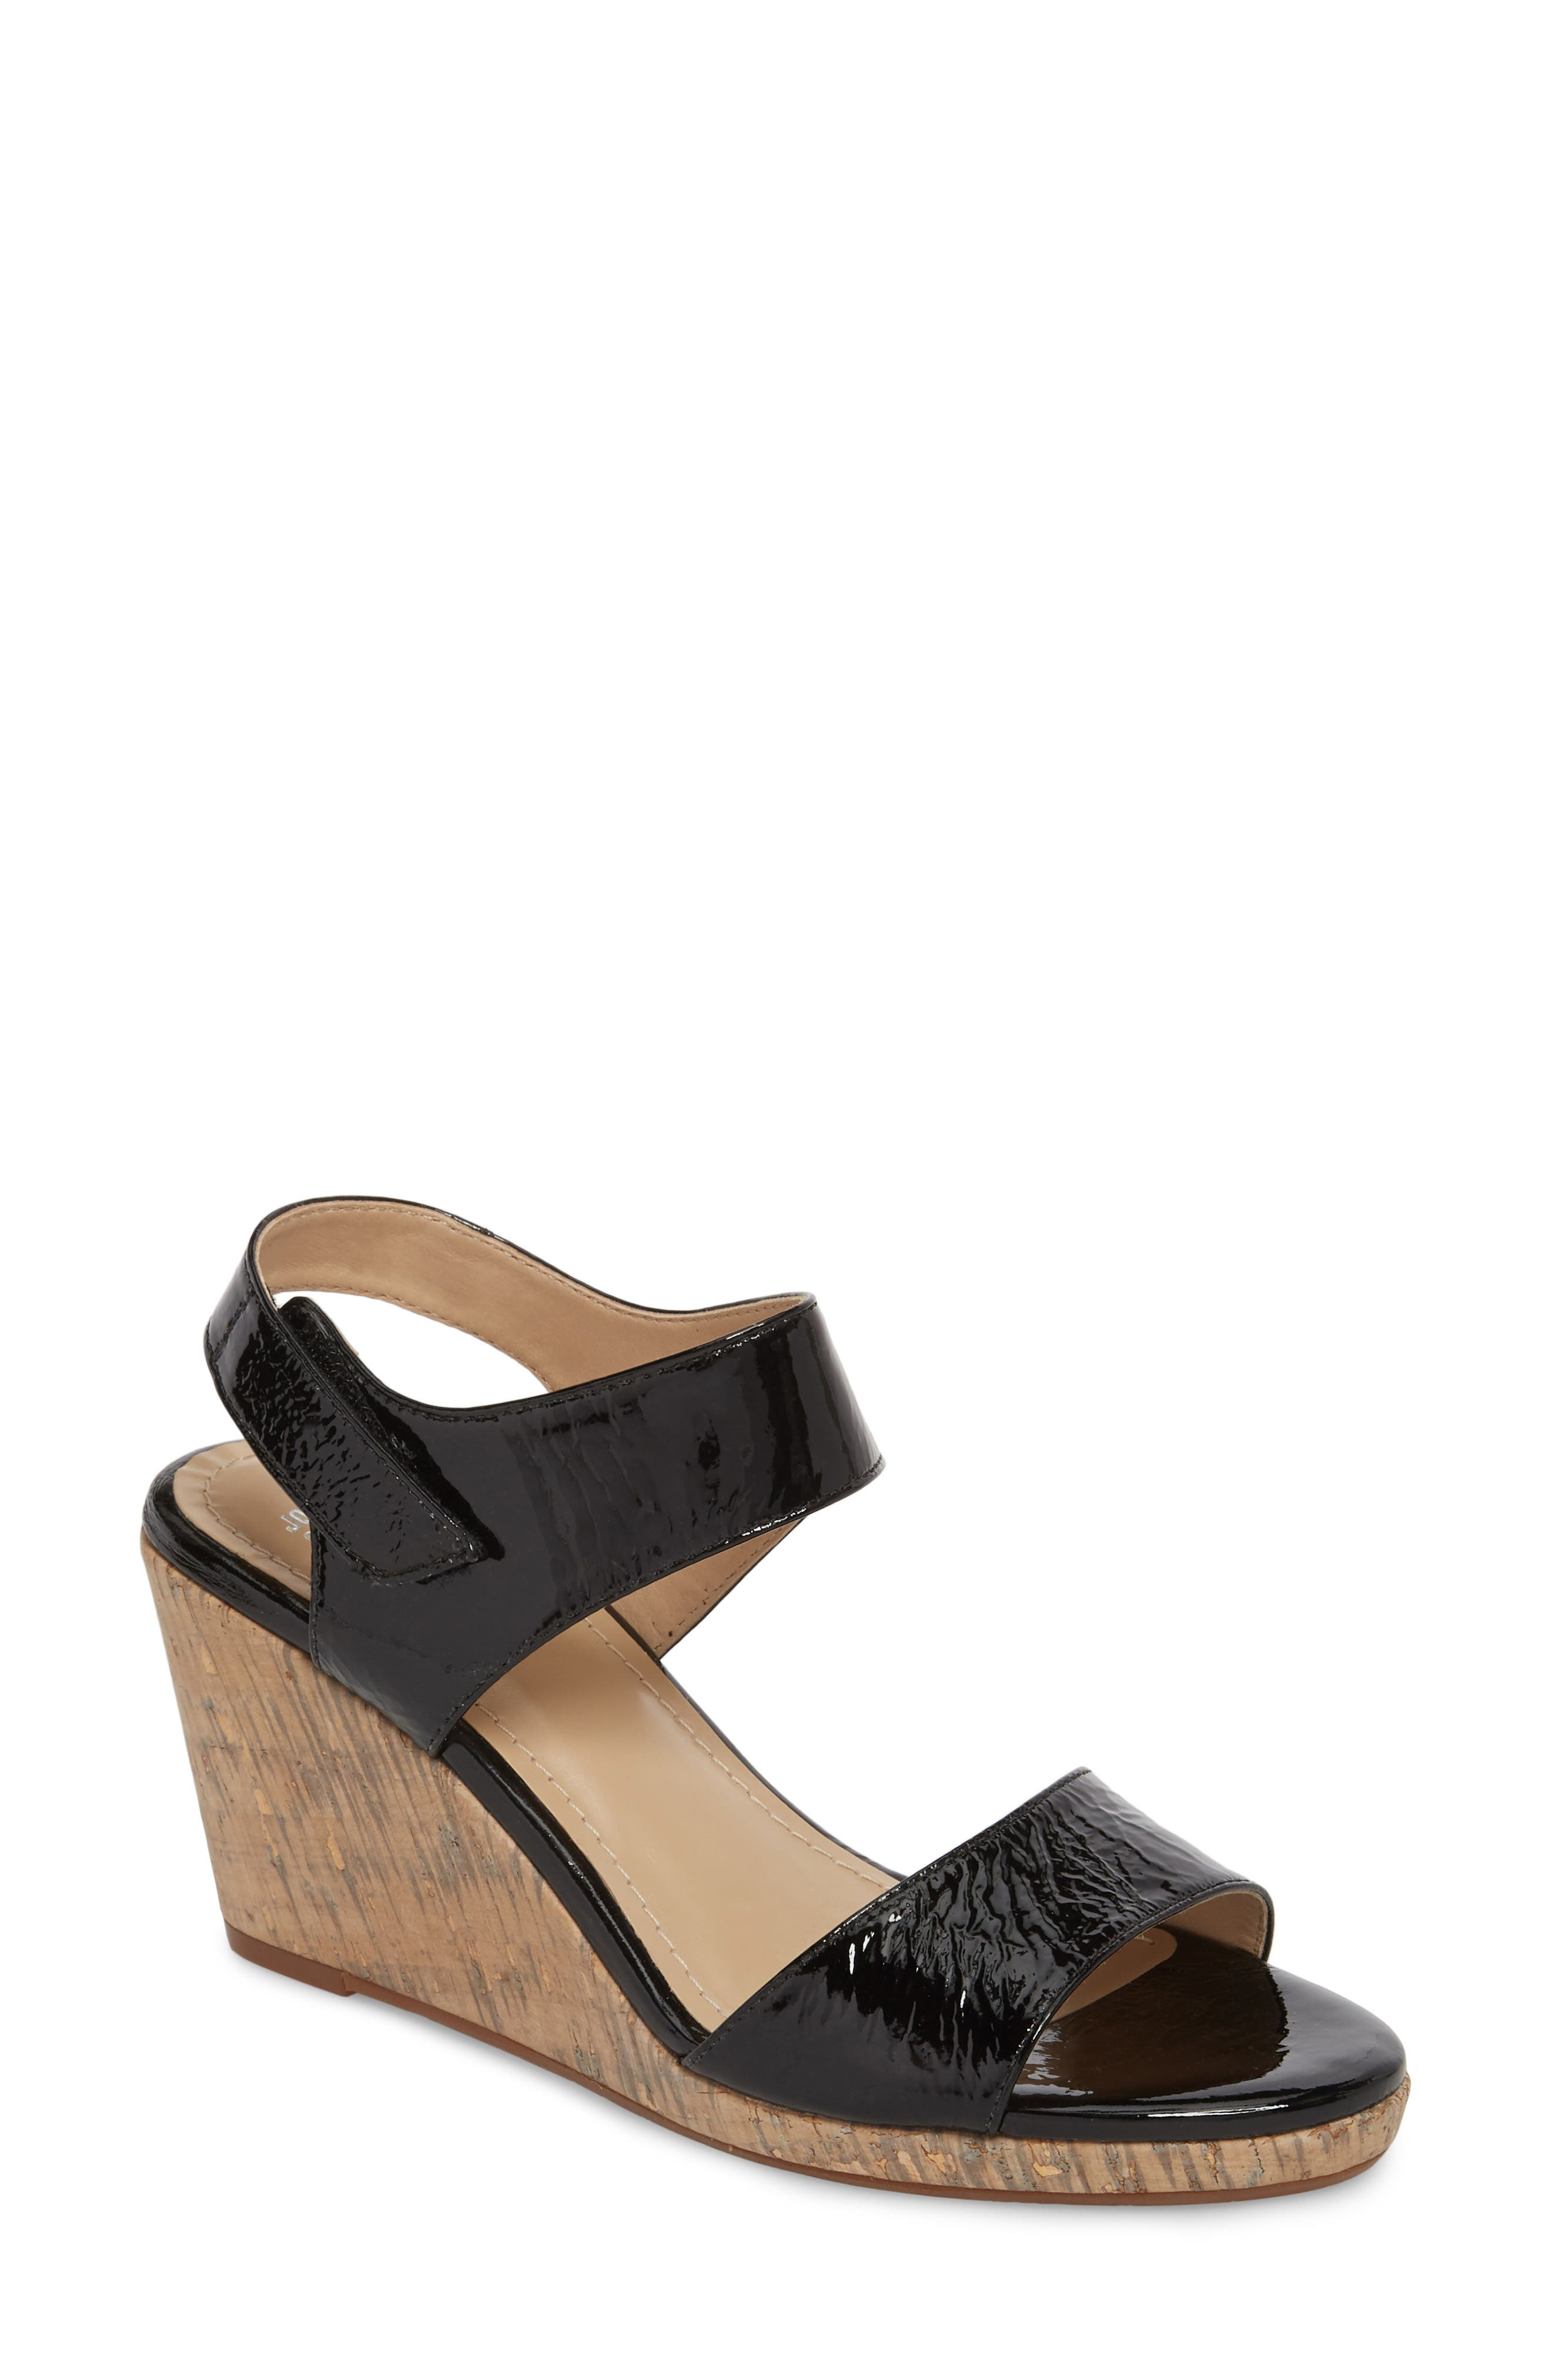 Glenna Wedge Sandal,                         Main,                         color,